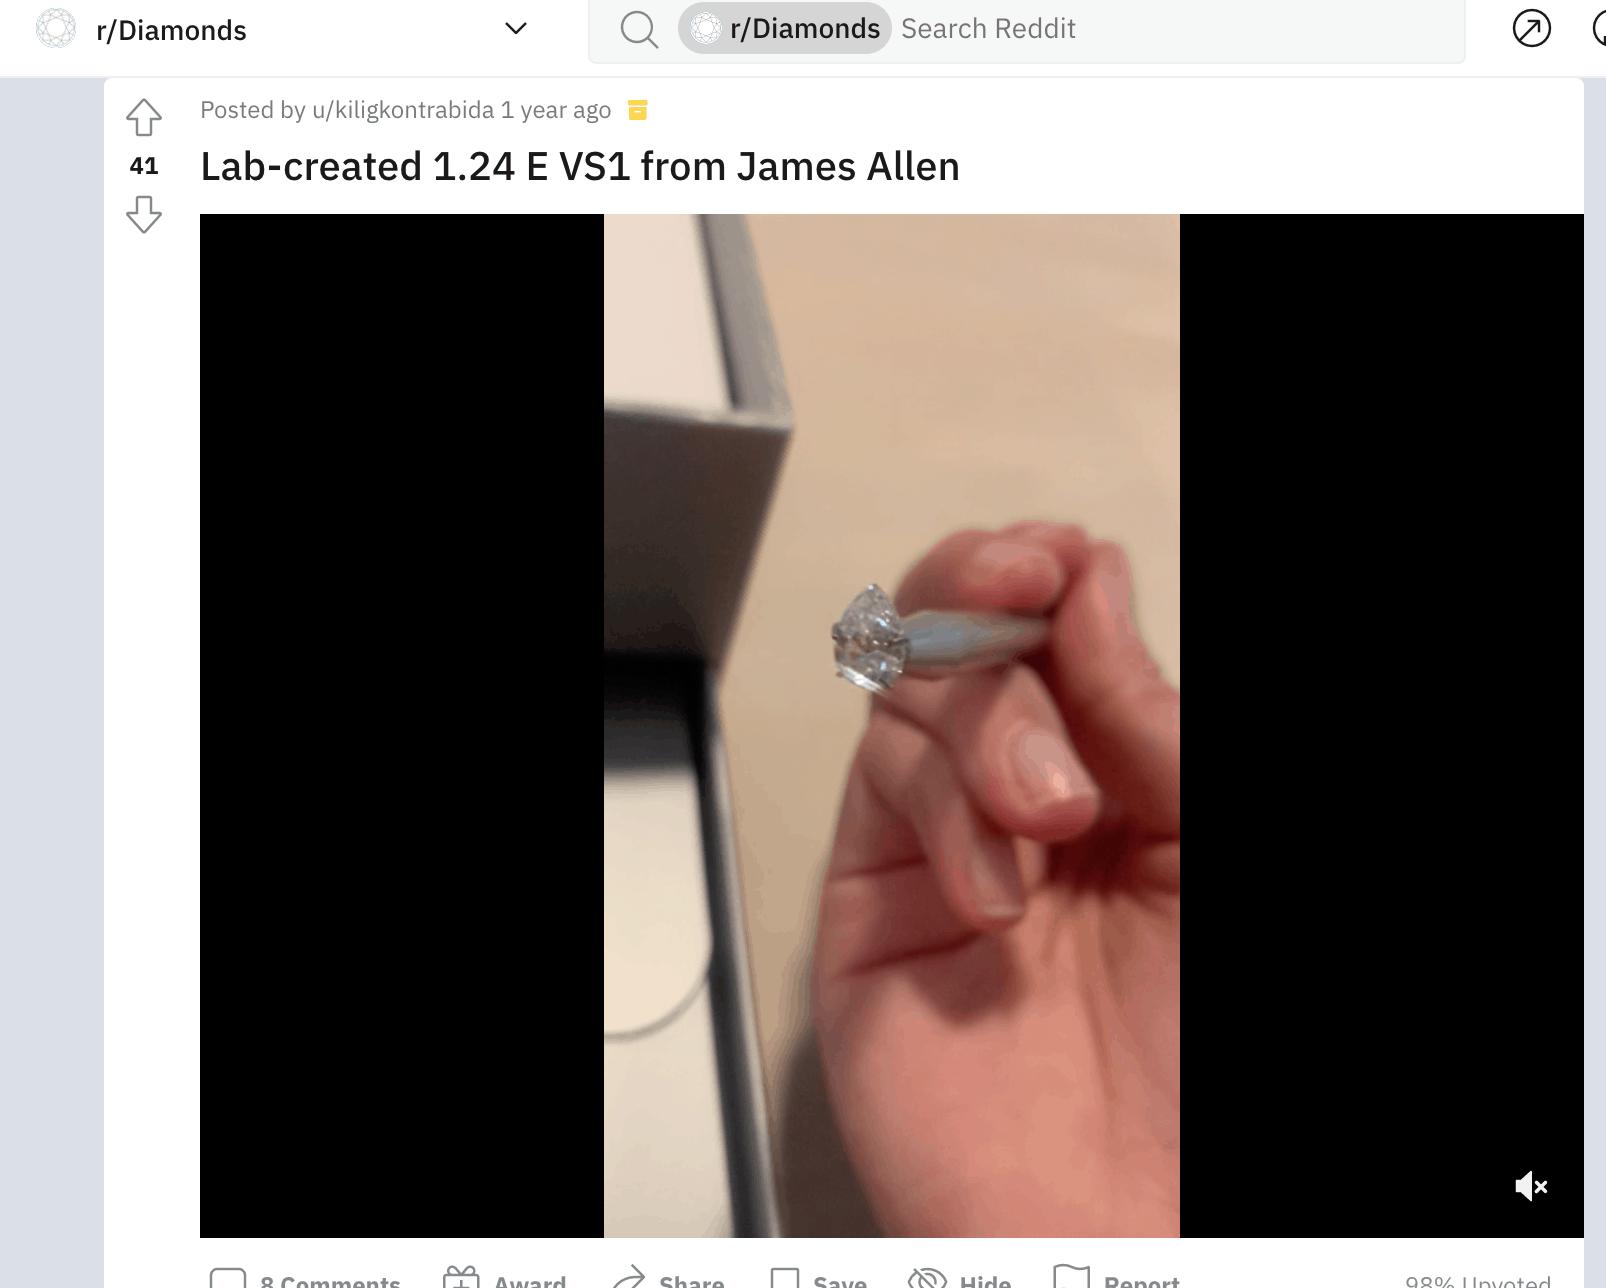 Reddit search